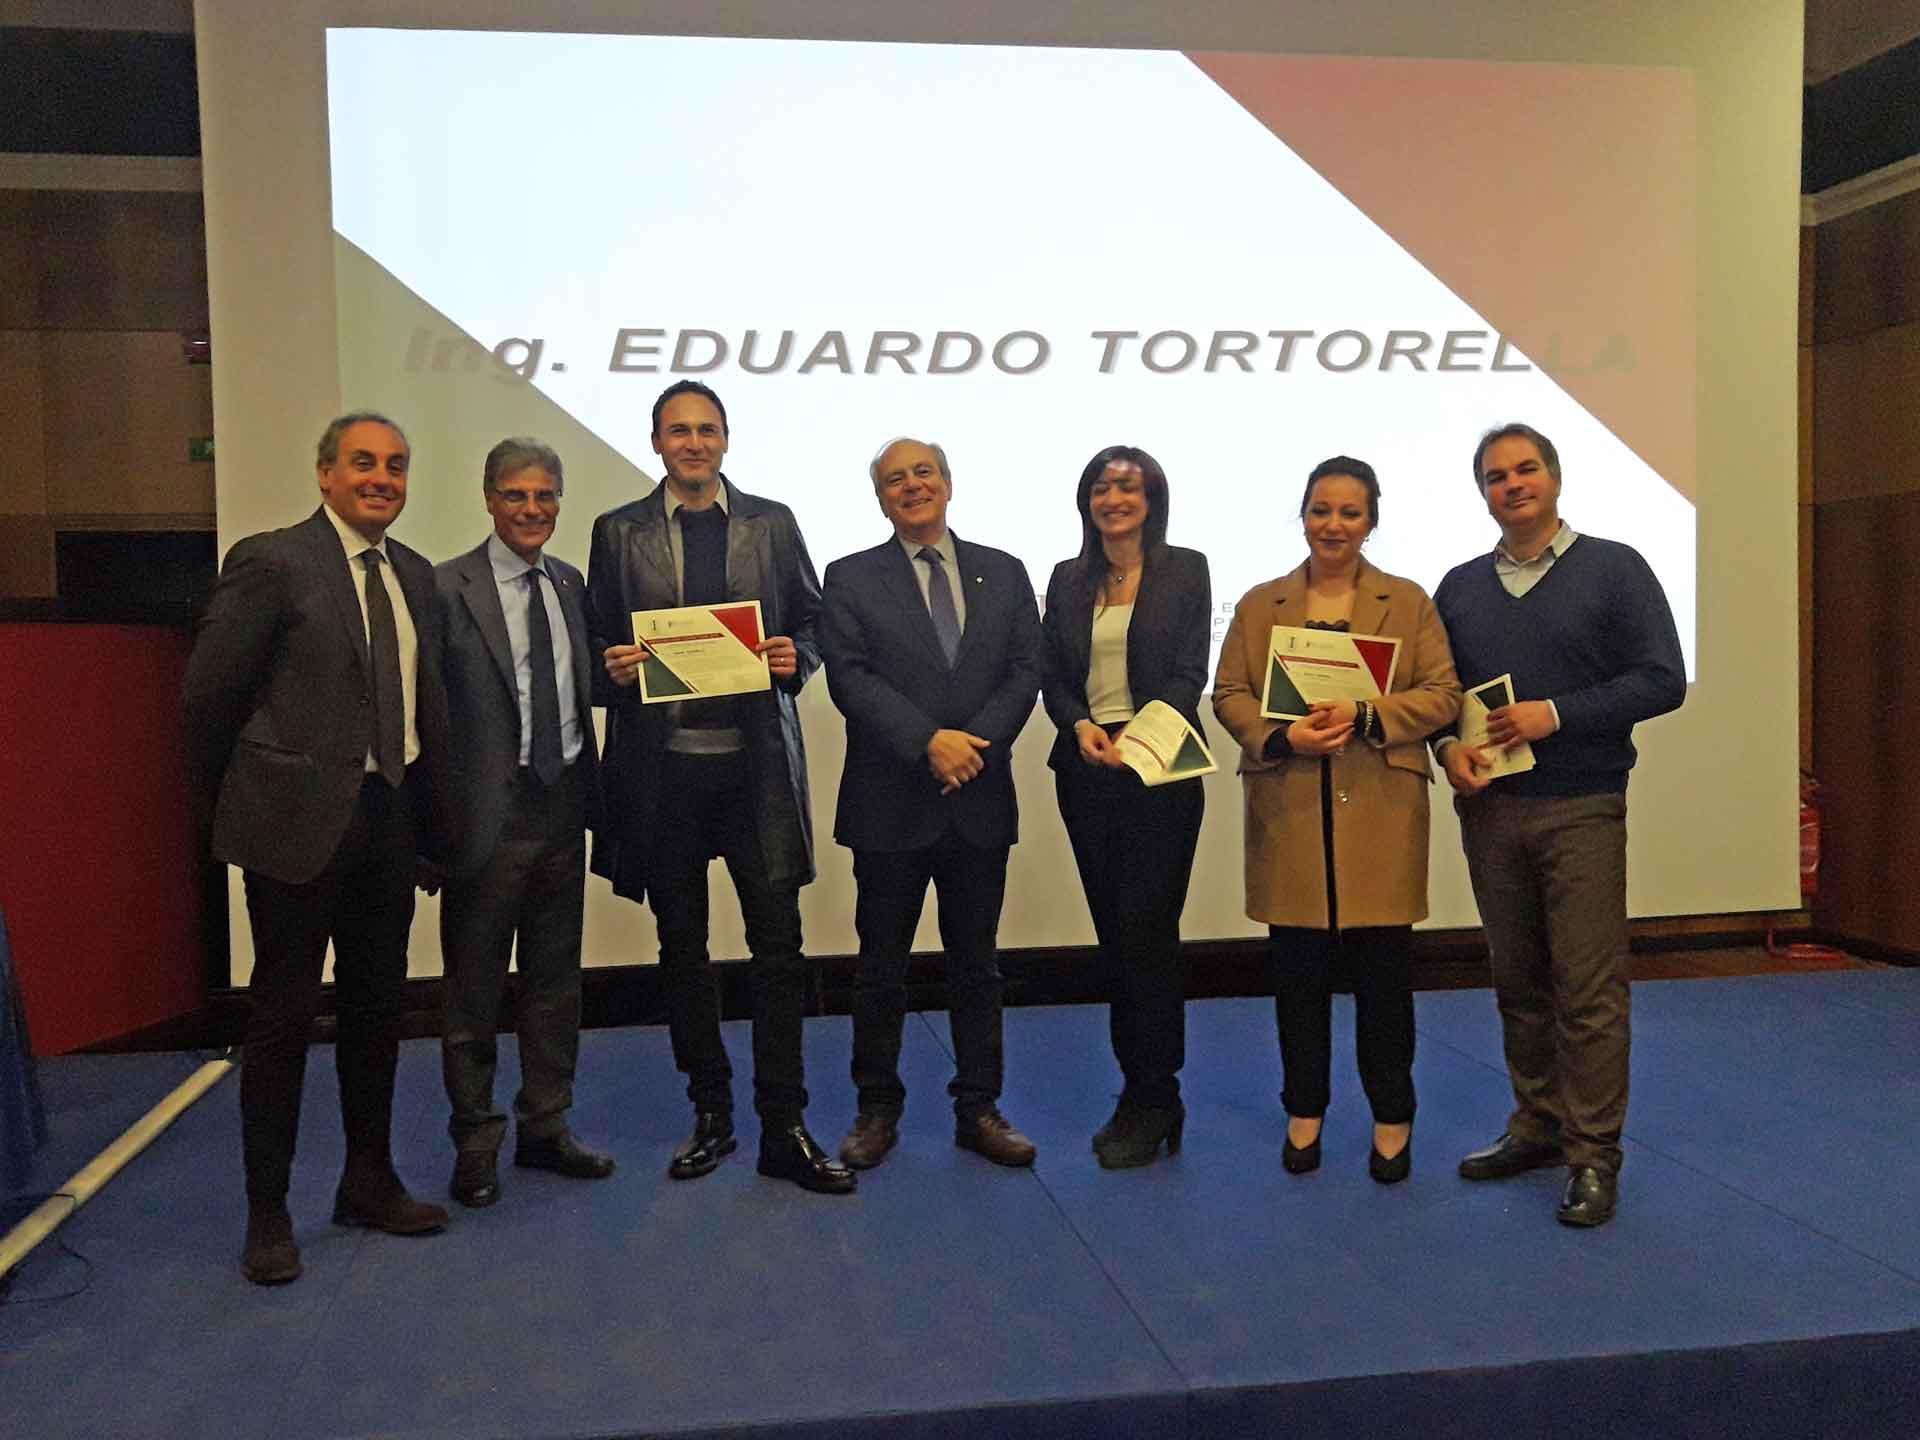 gruppo di lavoro studio ingegnere Eduardo Tortorella